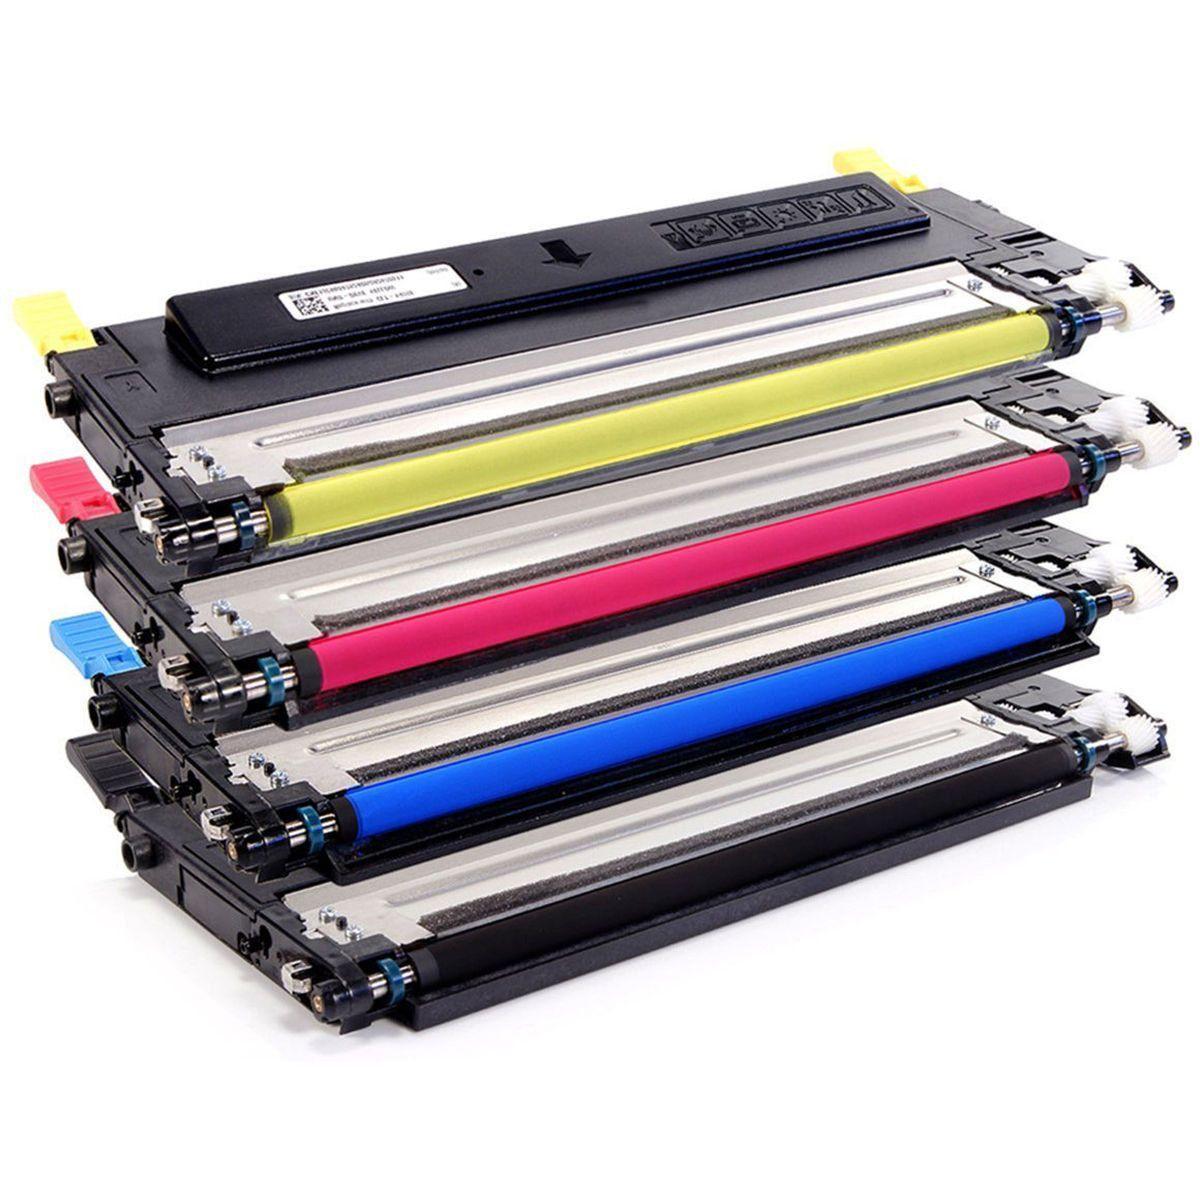 Compatível: Kit Colorido de Toner CLT-409 409S para Samsung CLX-3170 CLX-3175 CLP-310 CLP-315 3170fn 315w 3175fw